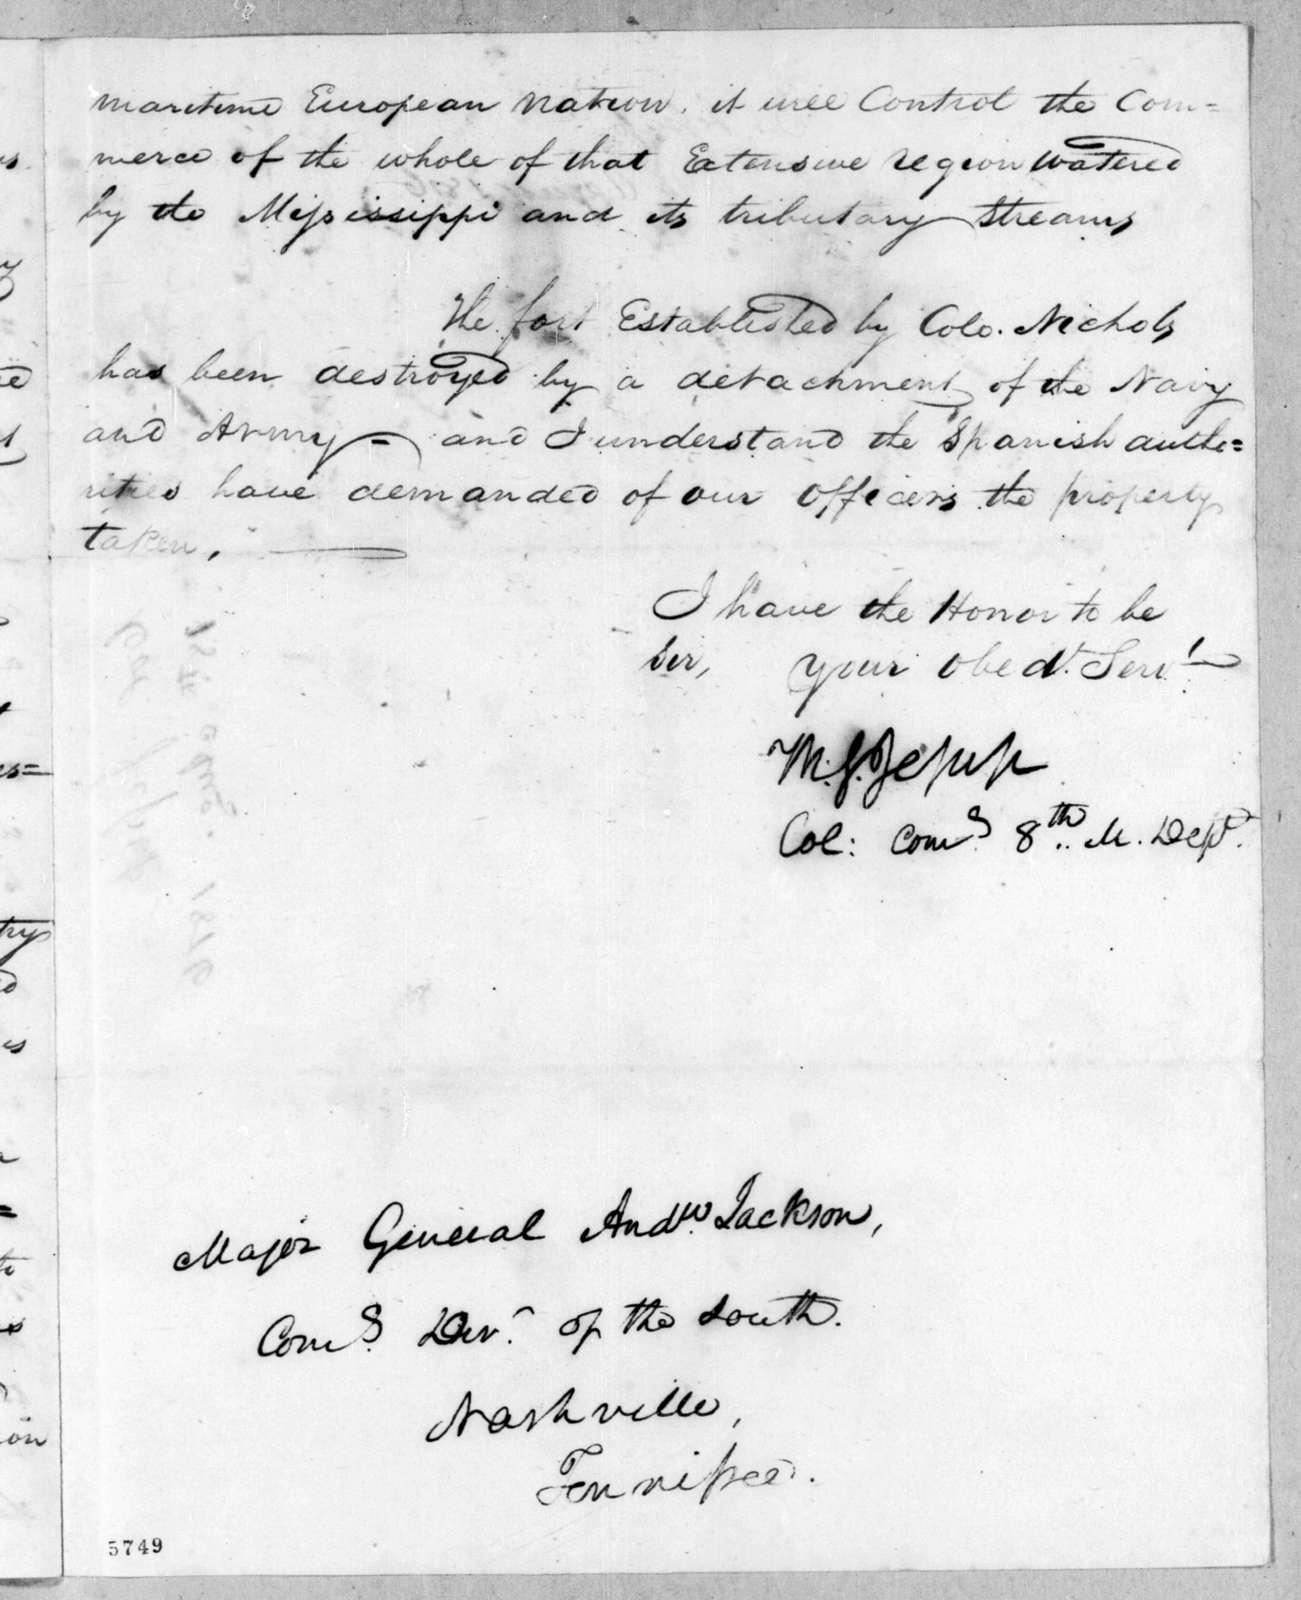 Thomas Sidney Jesup to Andrew Jackson, August 18, 1816